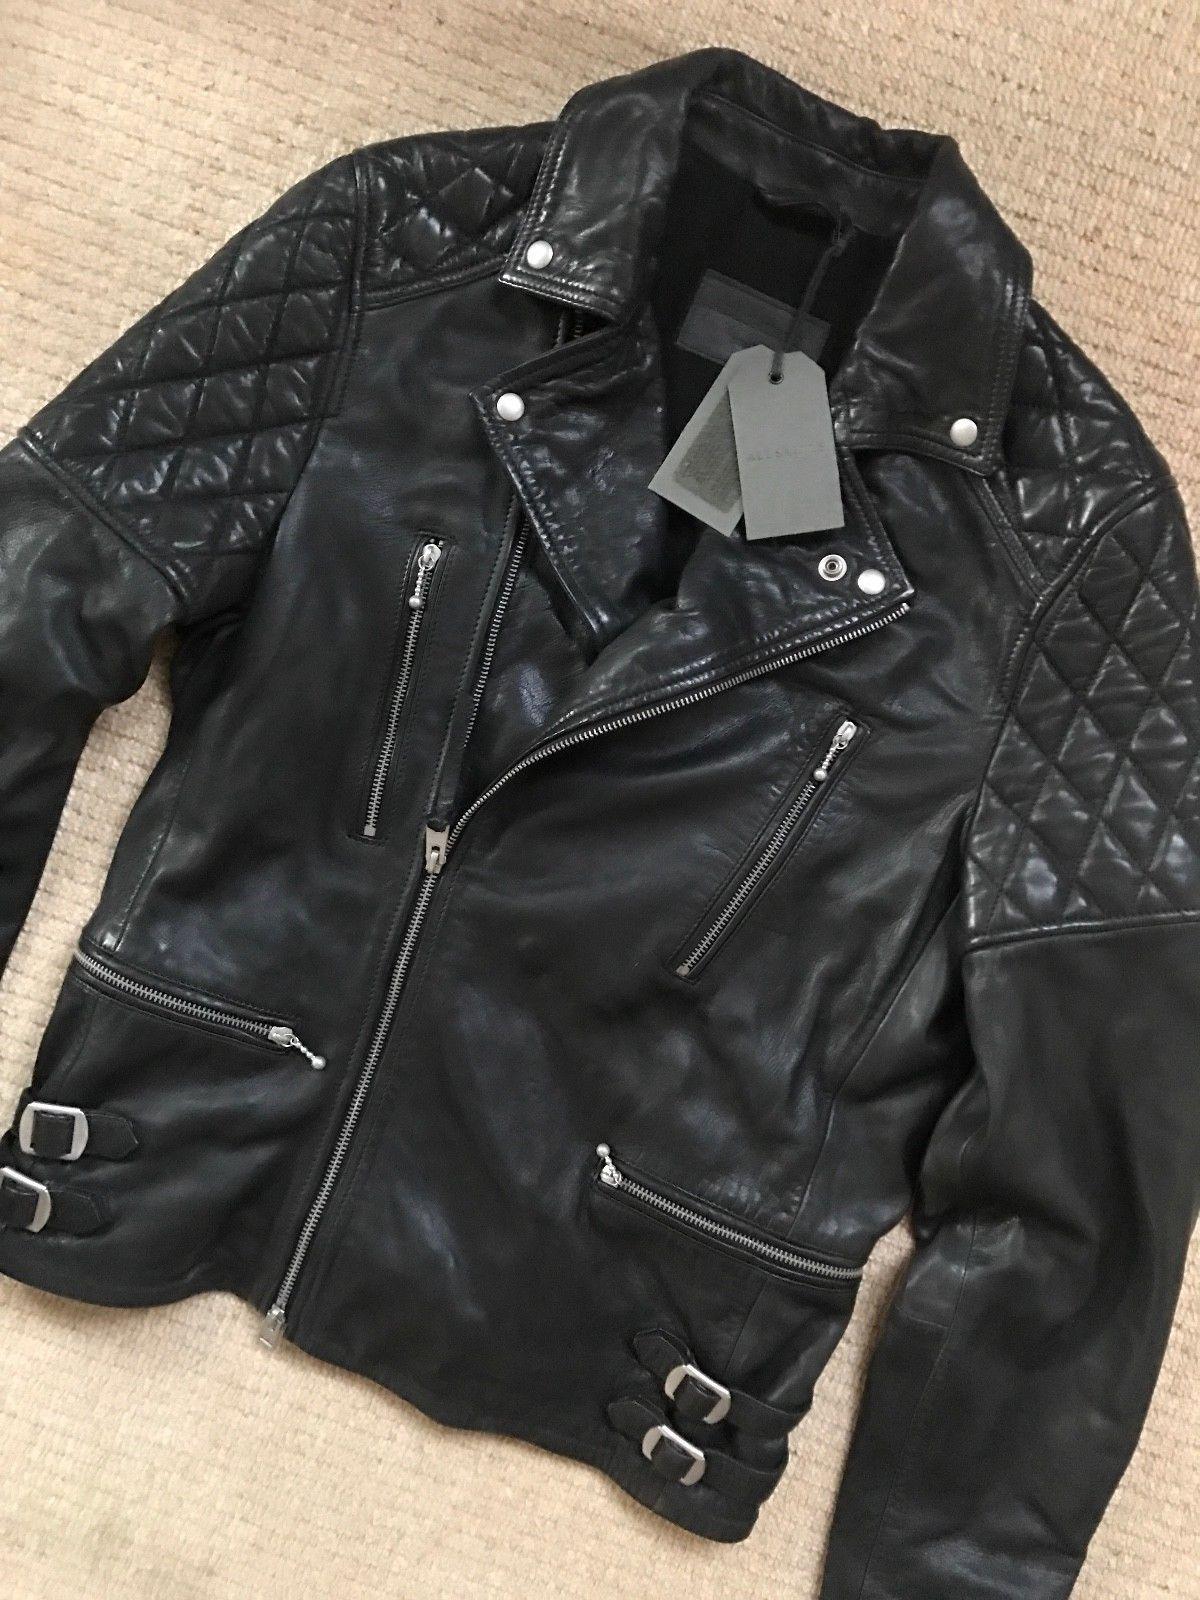 All Saints Men S Black Yuku Leather Biker Jacket Coat Xs S New Tags X4 Jackets Biker Jacket Coats Jackets [ 1600 x 1200 Pixel ]